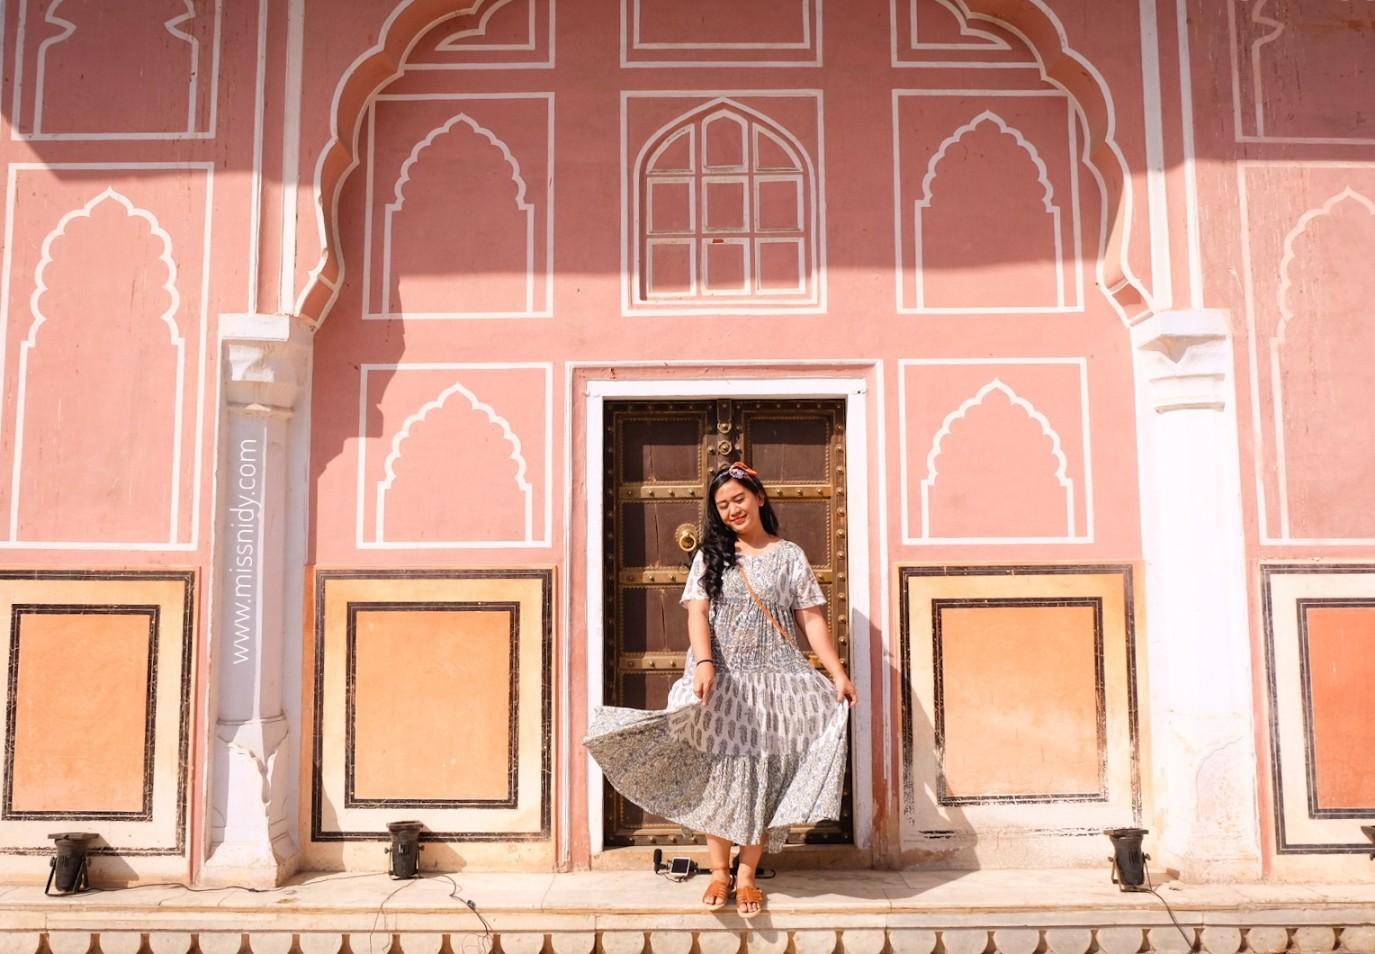 travelling ke india 2019